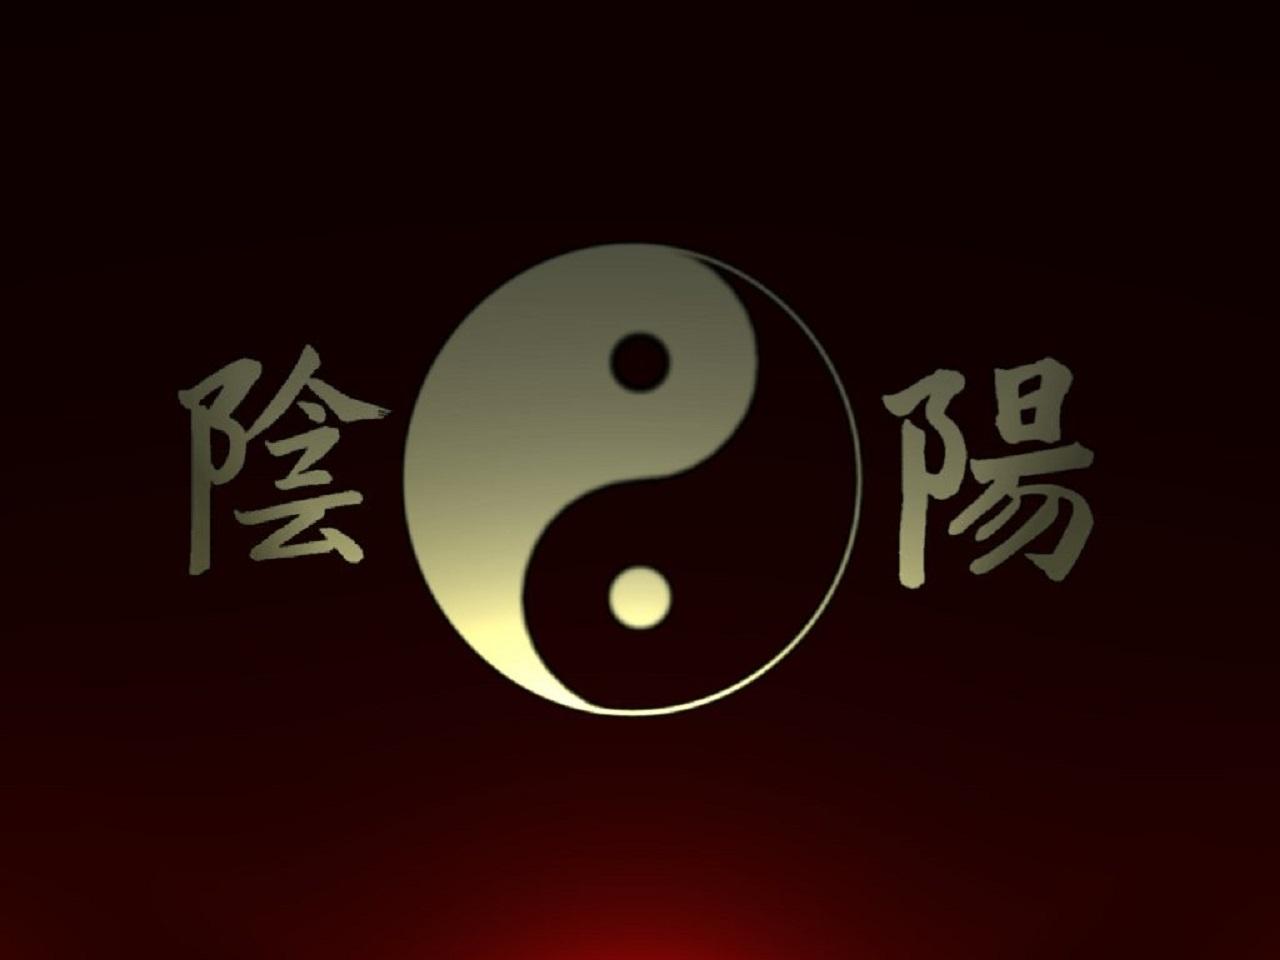 Dragon yin yang wallpaper wallpapersafari for Yin yang raumgestaltung